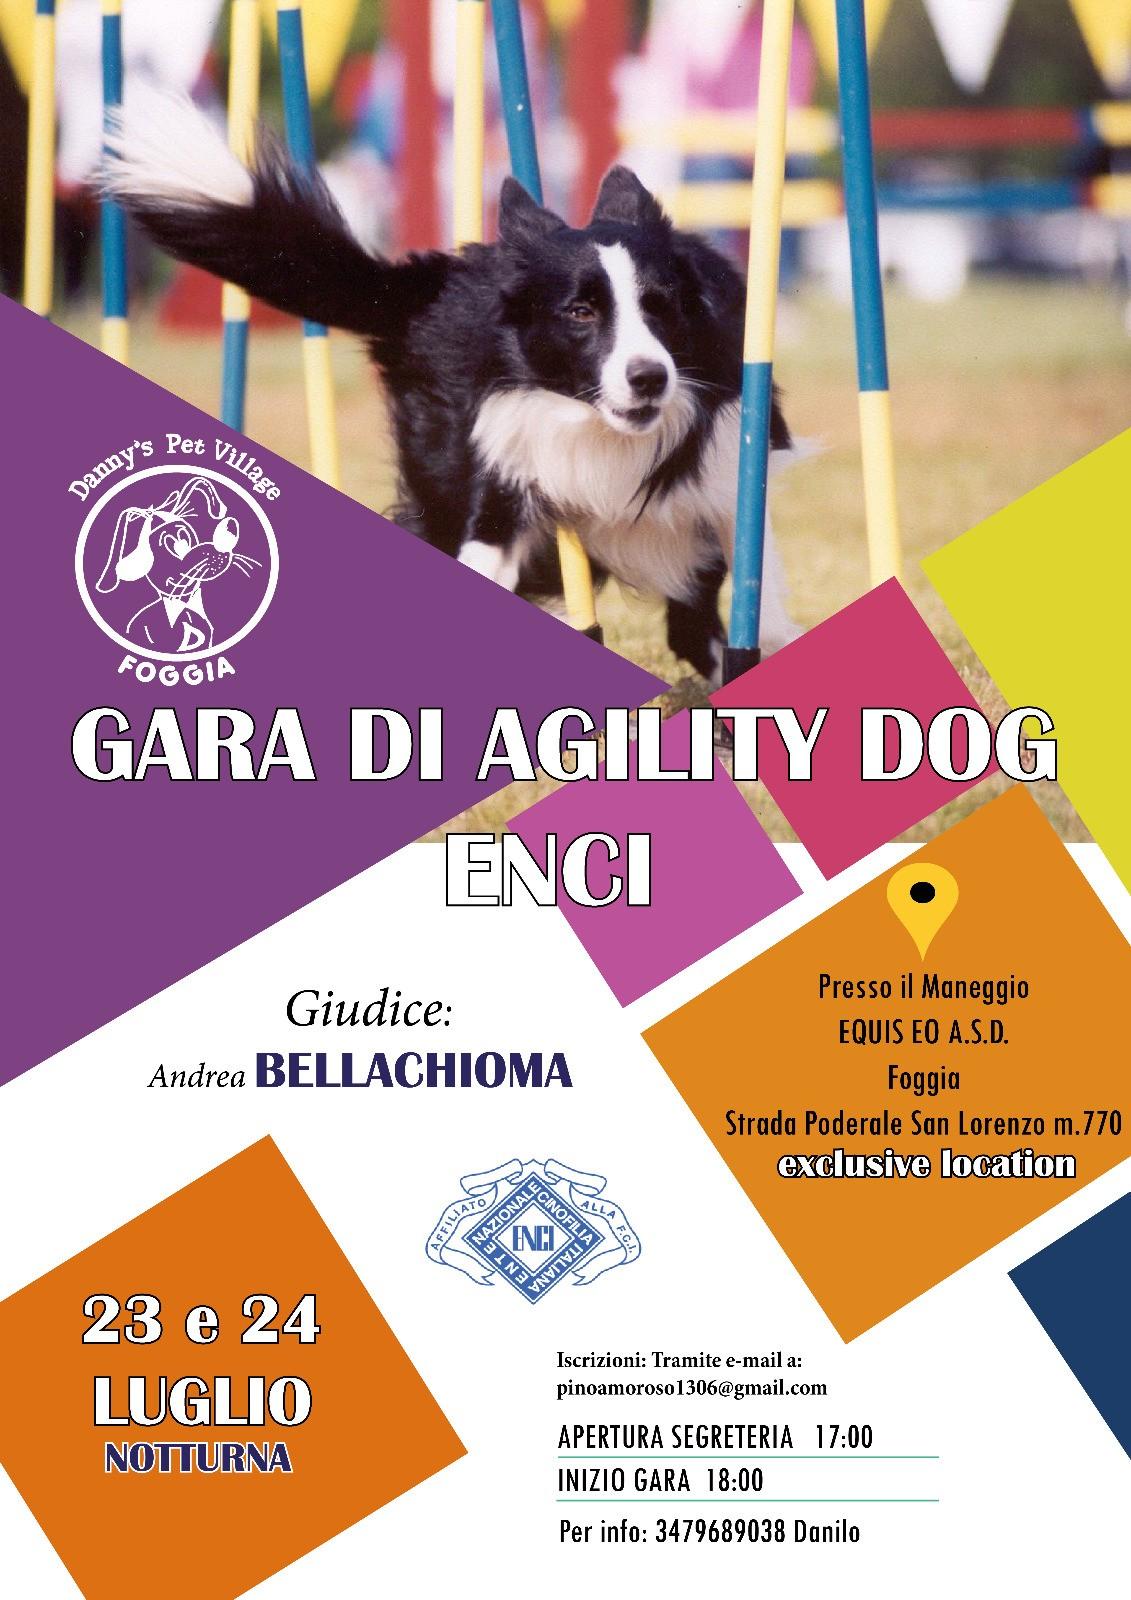 DANNY'S PET VILLAGE FOGGIA GARA AGILITY DOG